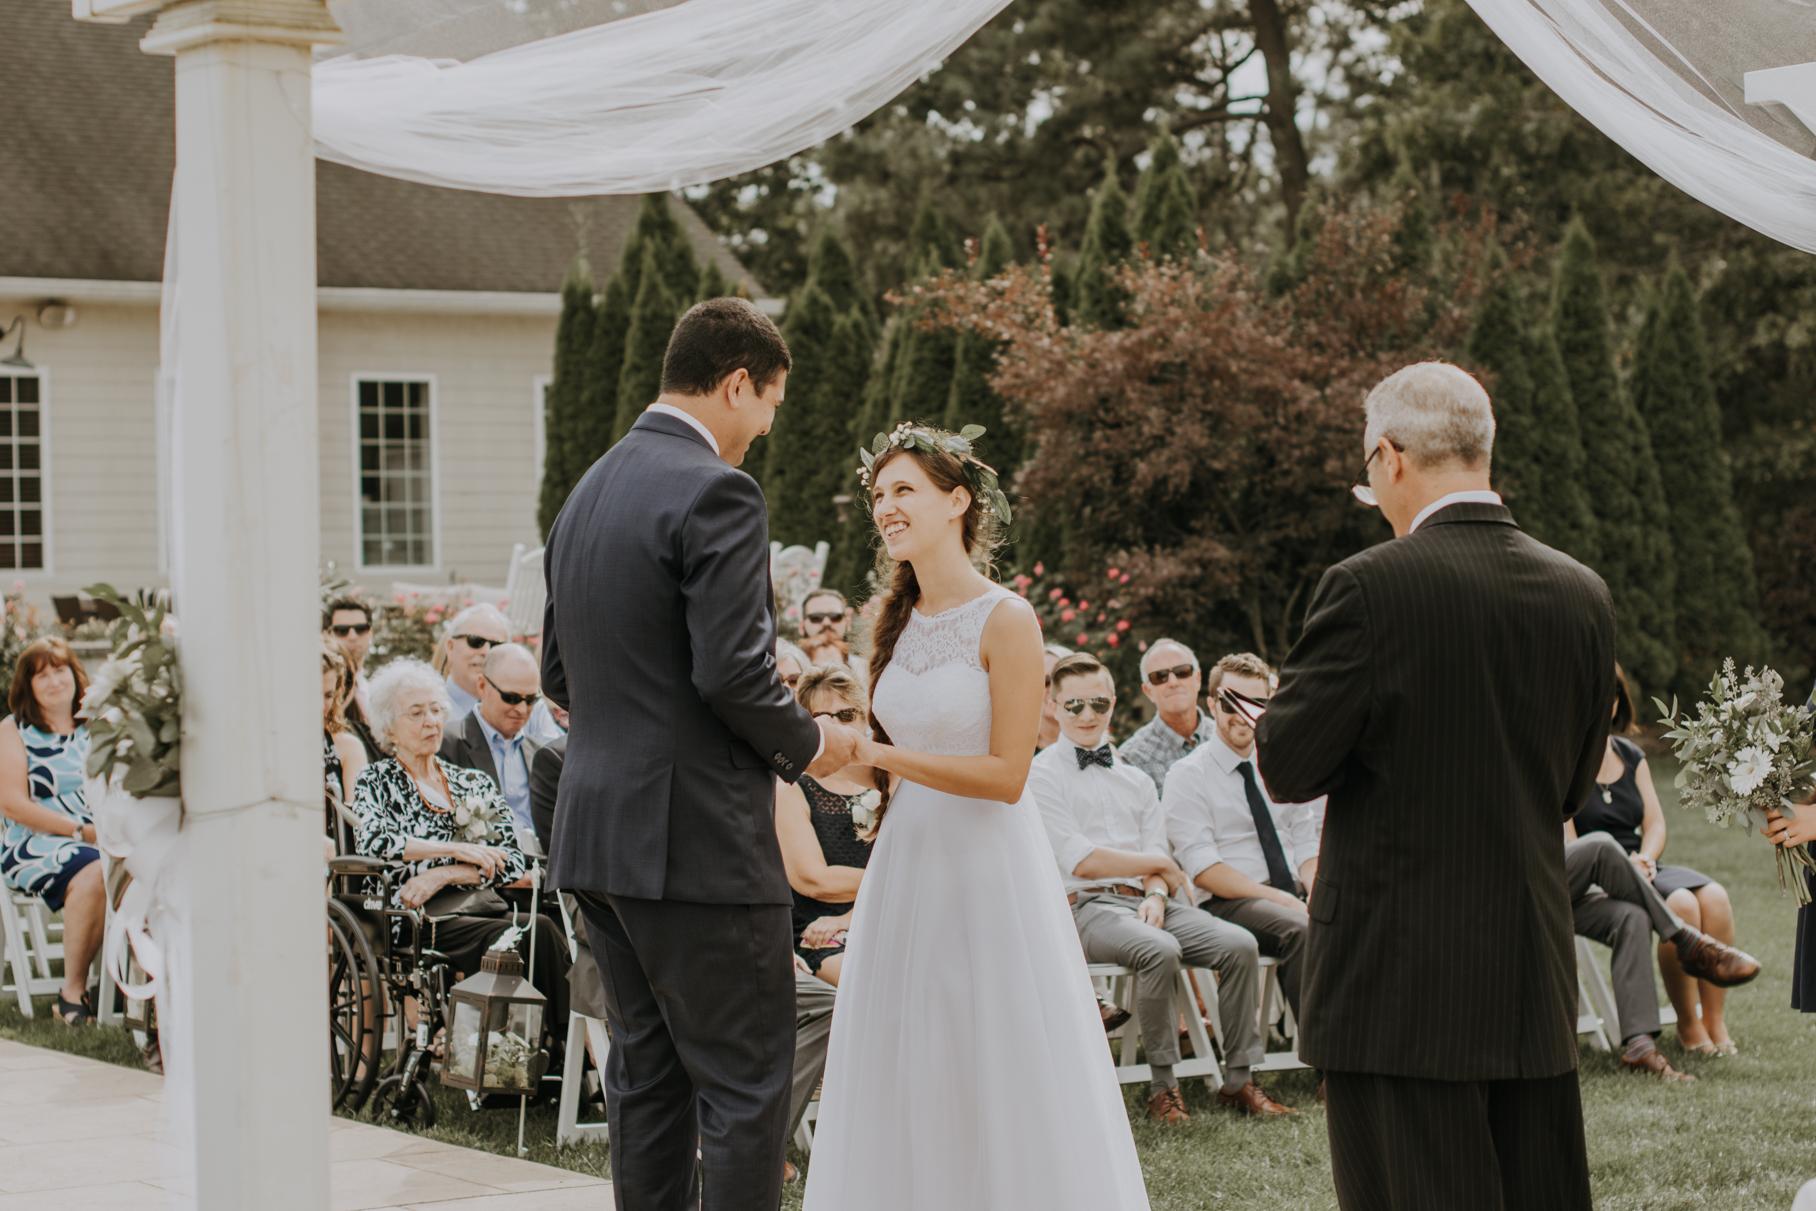 catie + chris | new york and tampa wedding photographer